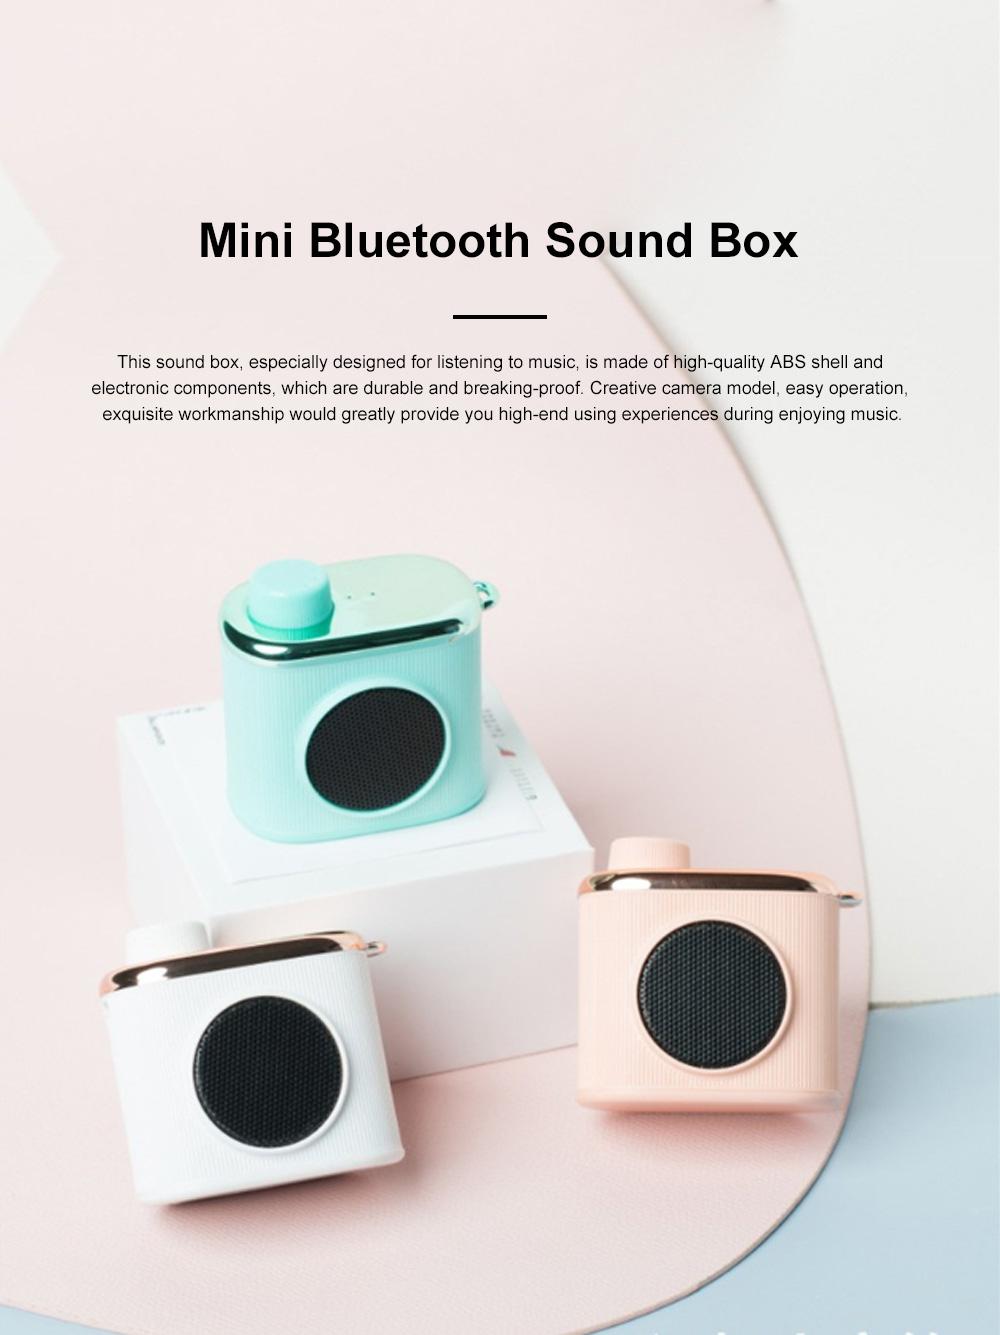 Portable Creative Vintage Camera Model Mini Bluetooth Sound Box Easy Operation USB Memory Loudspeaker Box 0